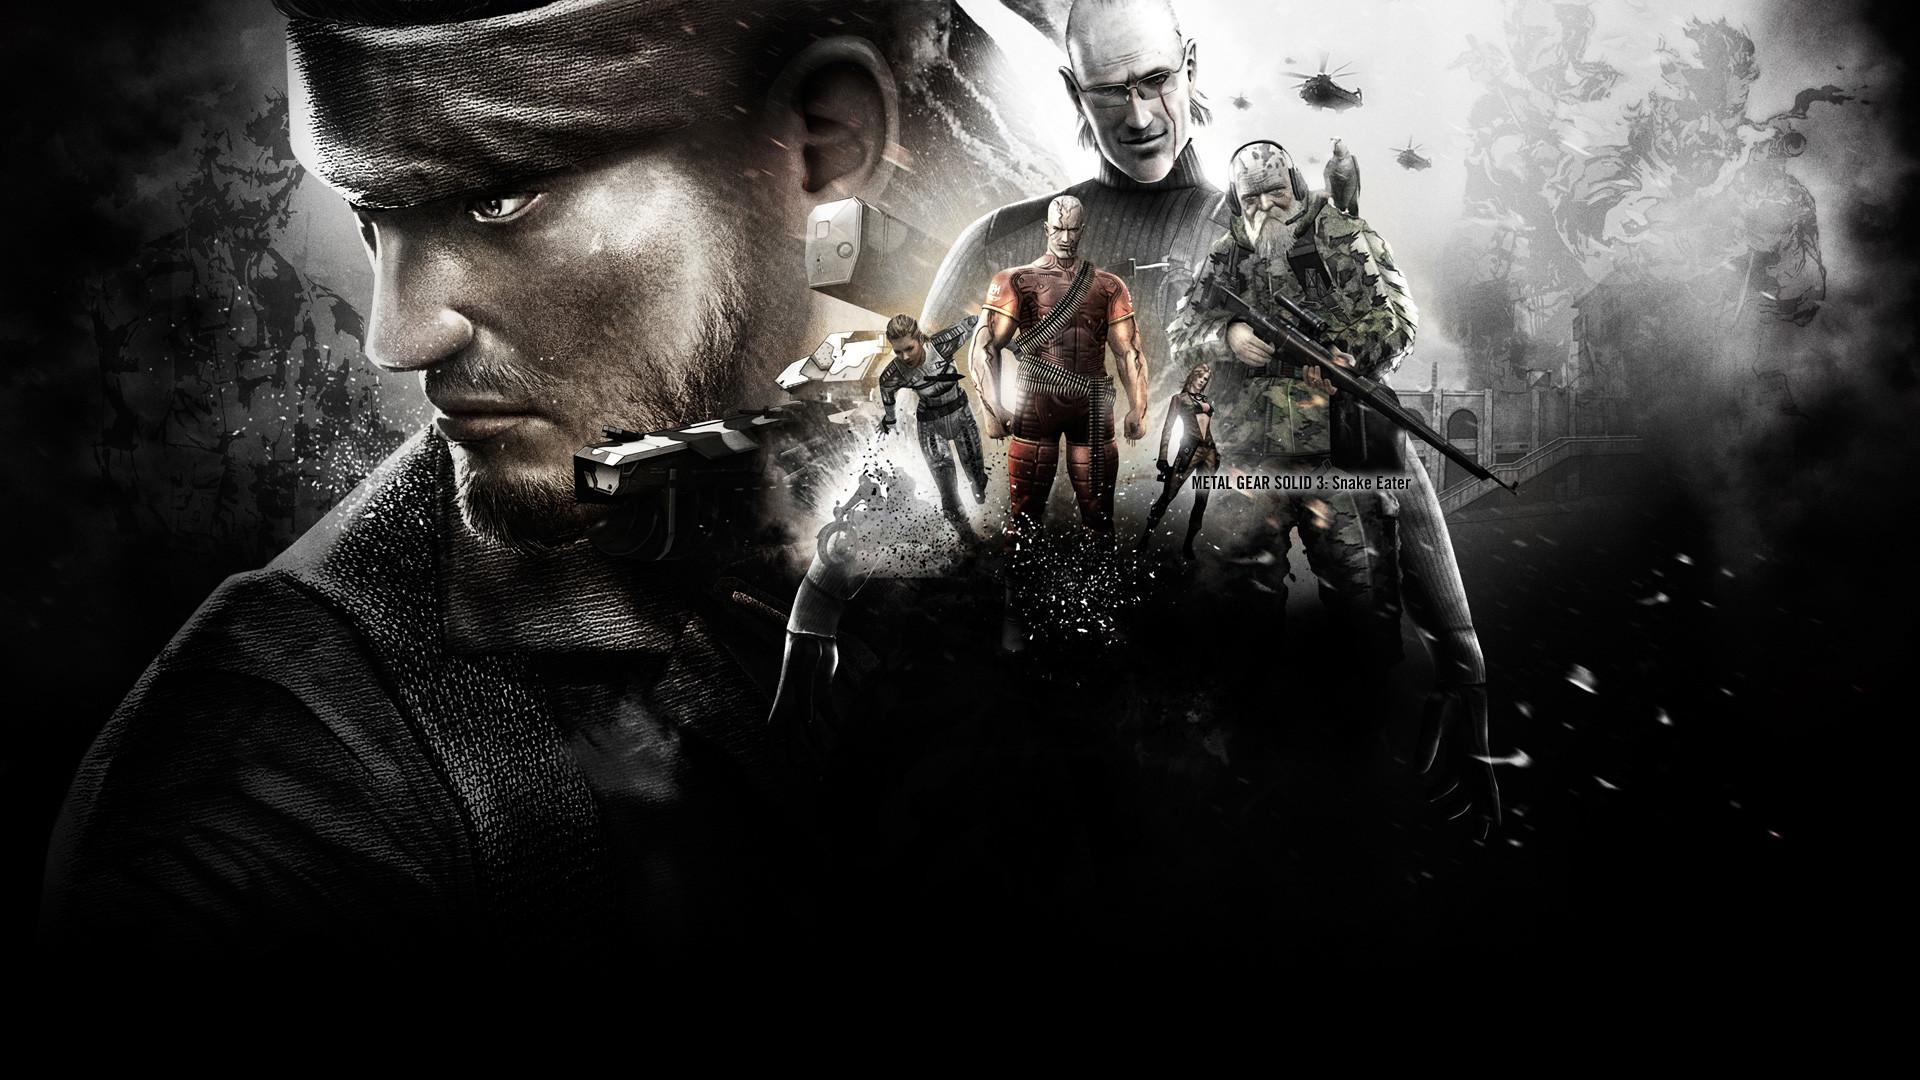 Metal Gear Wallpaper Metal, Gear, Solid, Big, Boss, The,